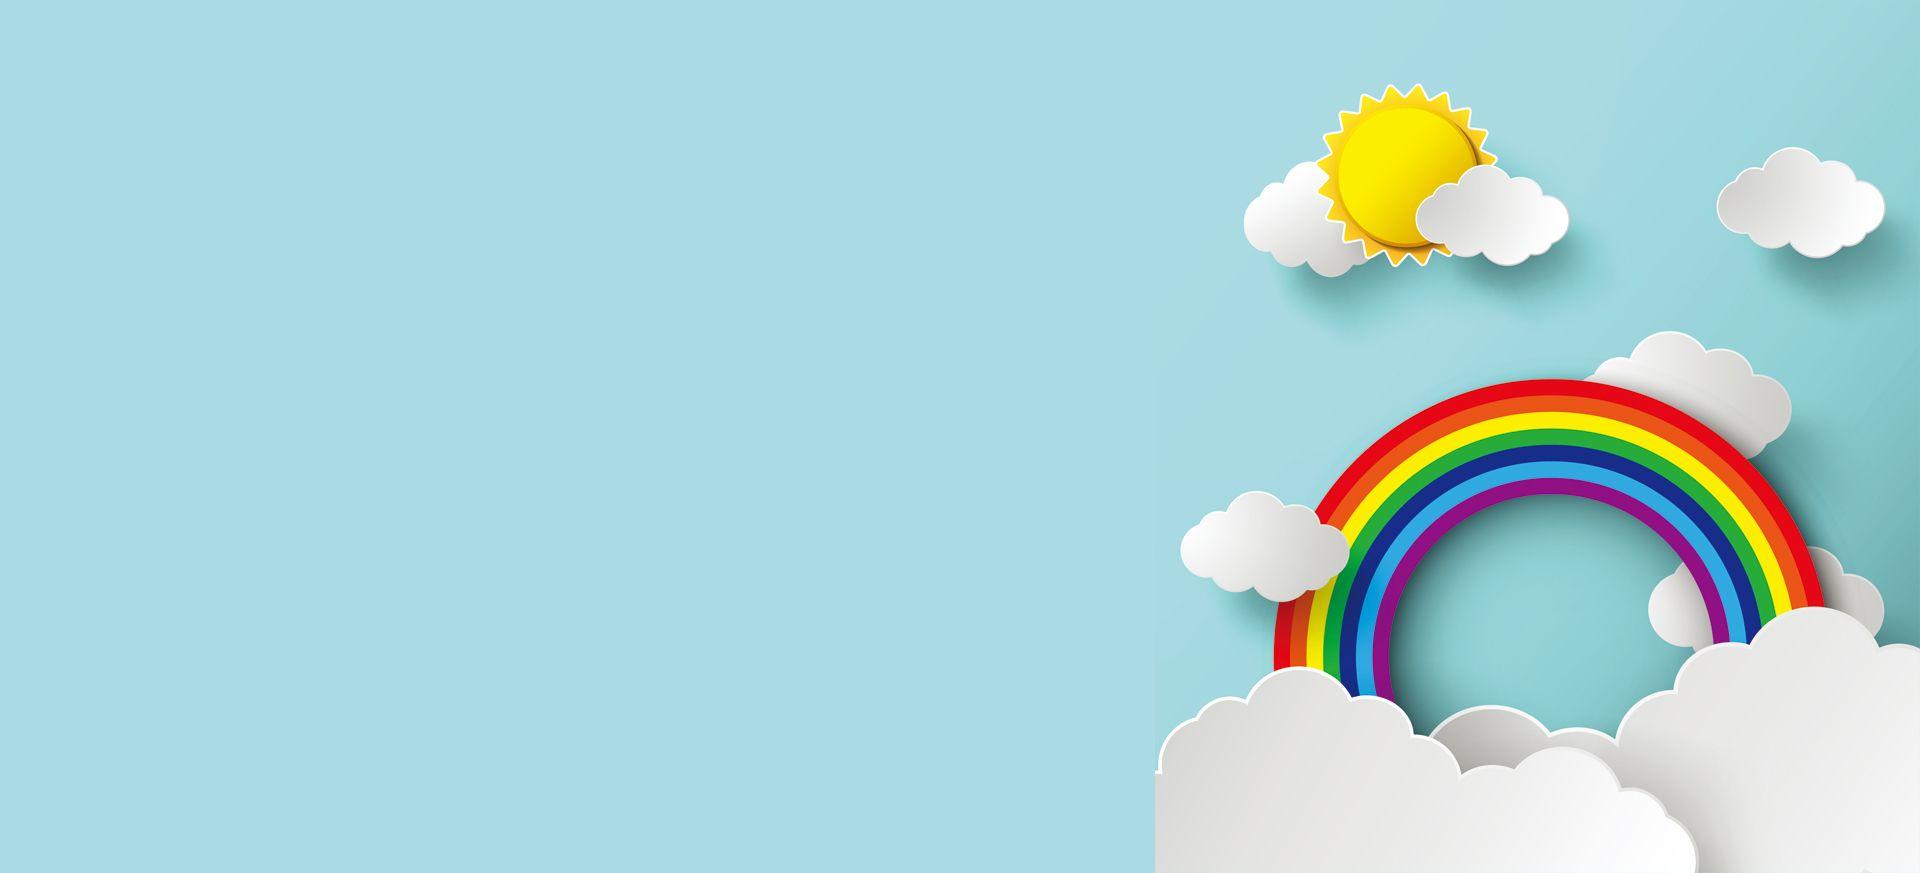 Arco Iris Nuvens Plano De Fundo Banner Cartoon Sol Cartoon Sun Wallpaper Powerpoint Background Banner